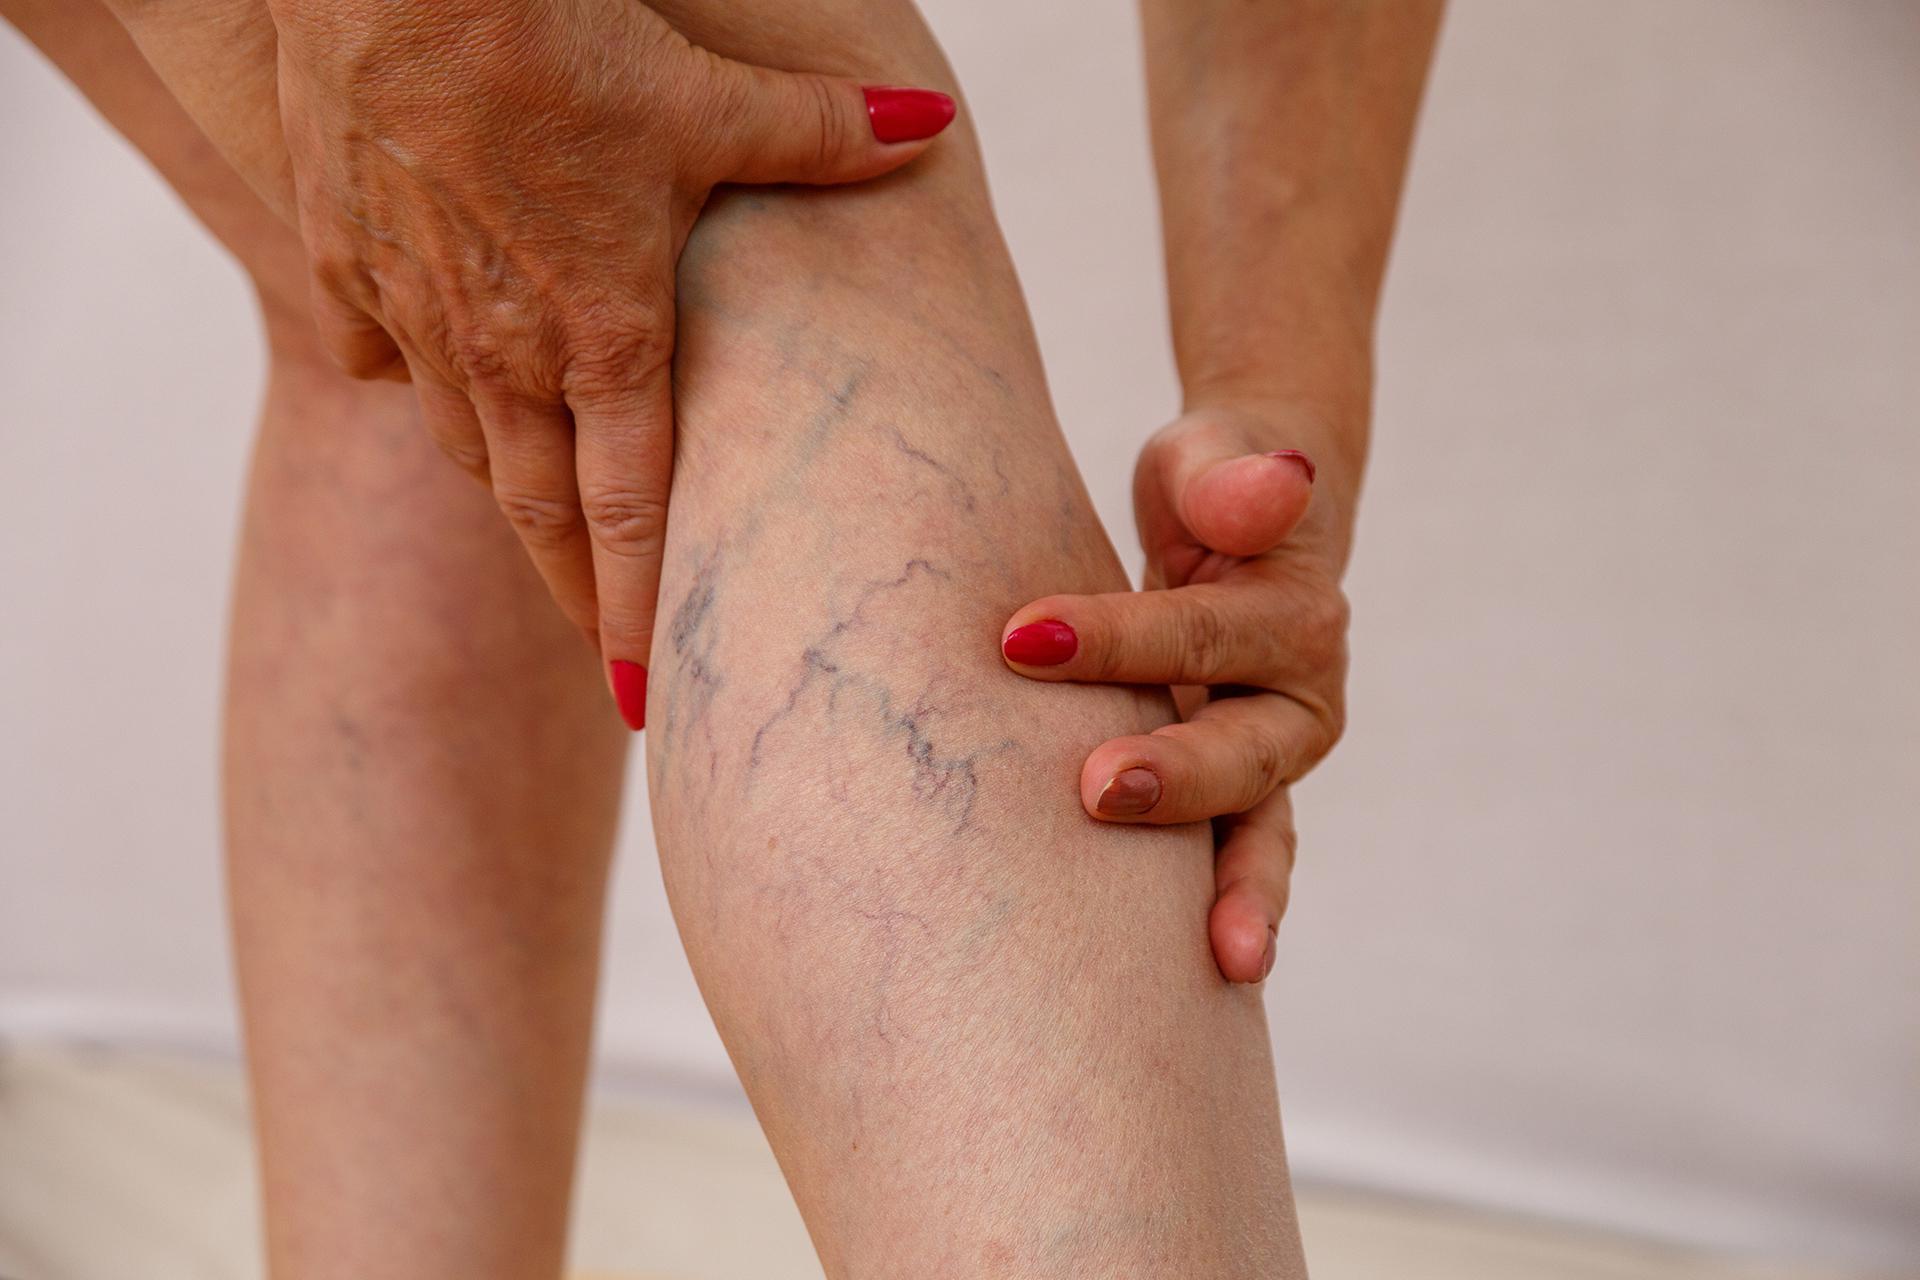 vascular-issues-requiring-leg-pain-doctor-Seal-Beach